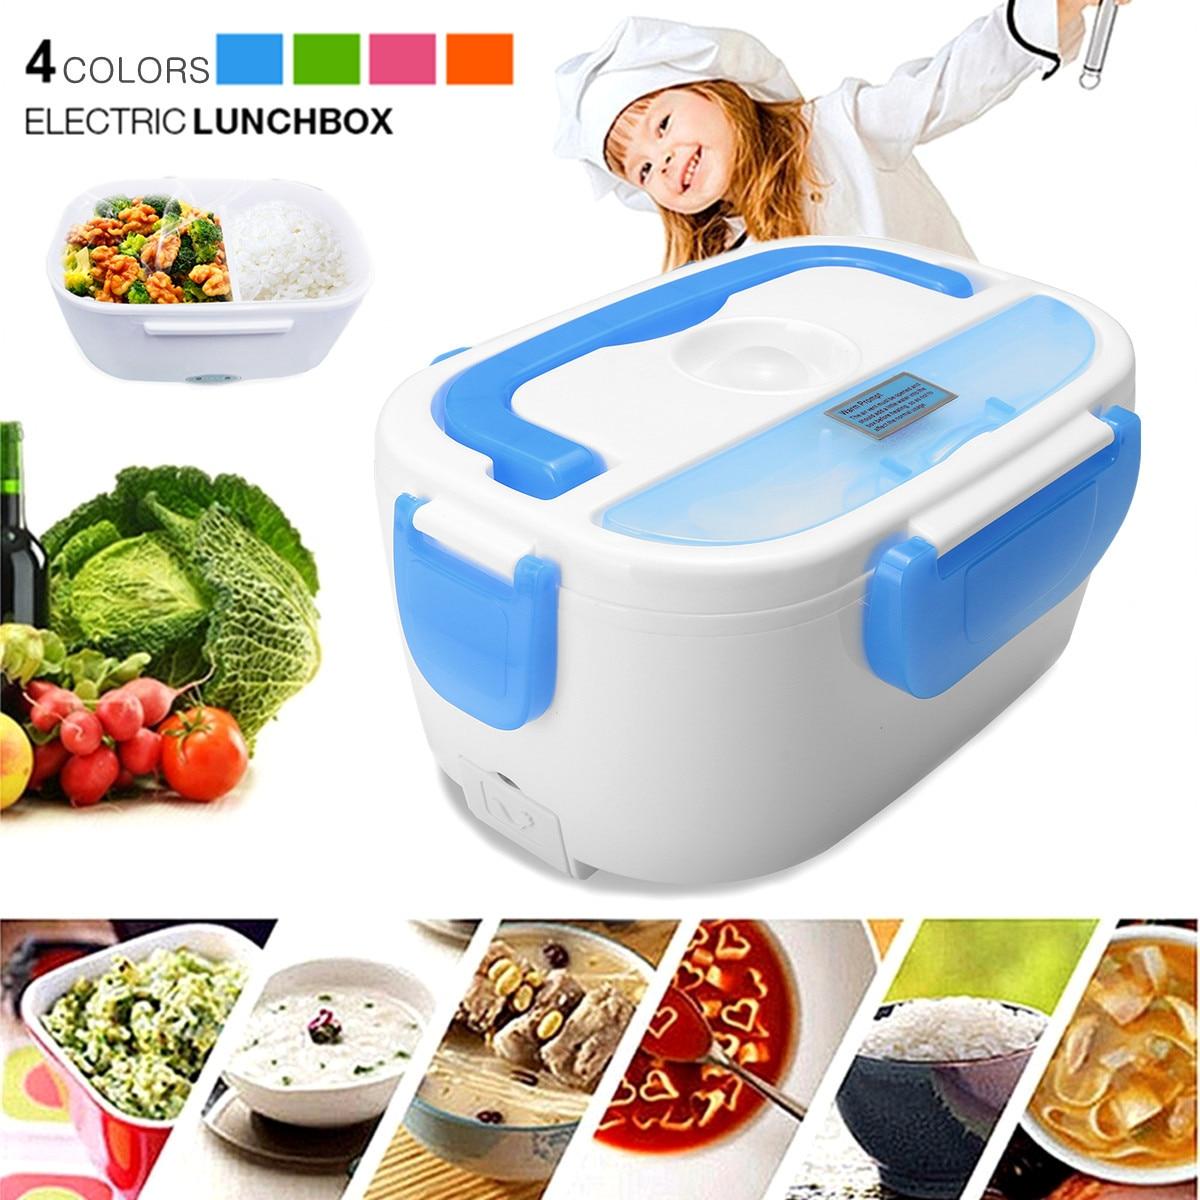 купить EU 220V 1.05L Electric Heating Portable Heated Lunch Box Truck Oven Cooker Food Warmer Food Grade Plastic Heat Warm function по цене 879.21 рублей